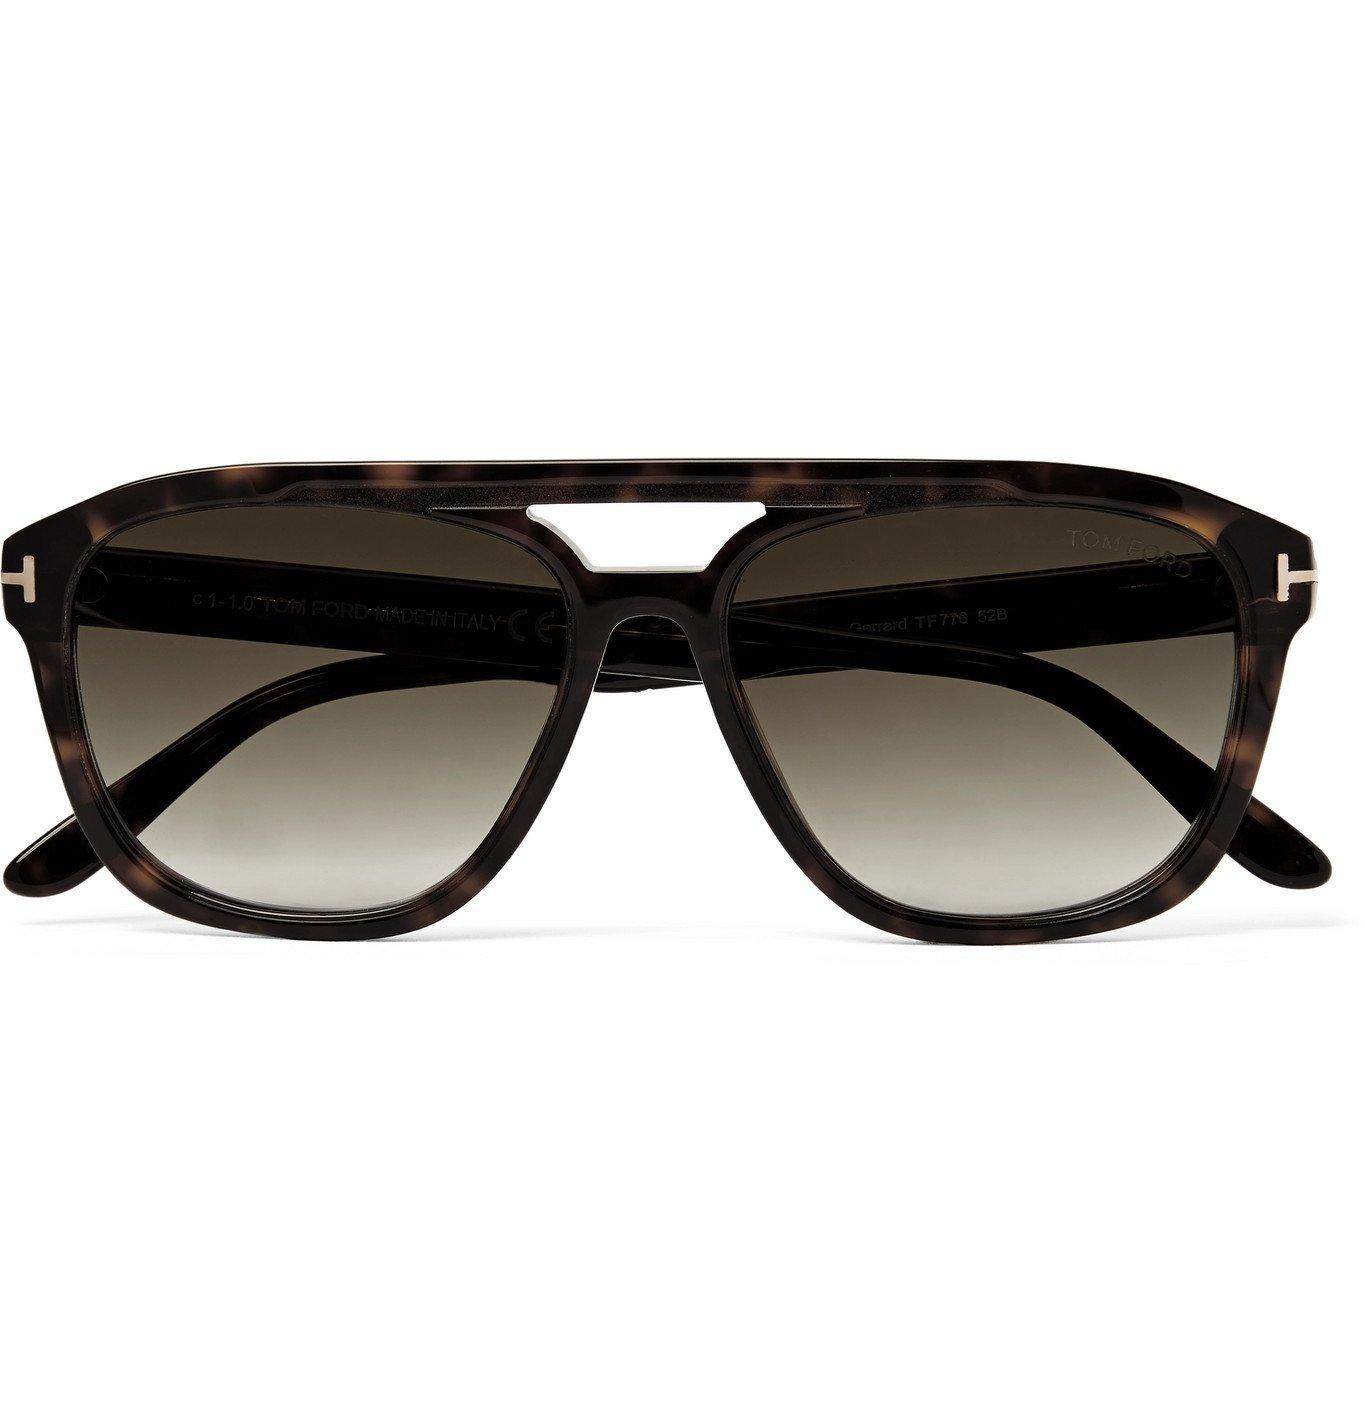 Photo: TOM FORD - Aviator-Style Tortoiseshell Acetate Sunglasses - Tortoiseshell